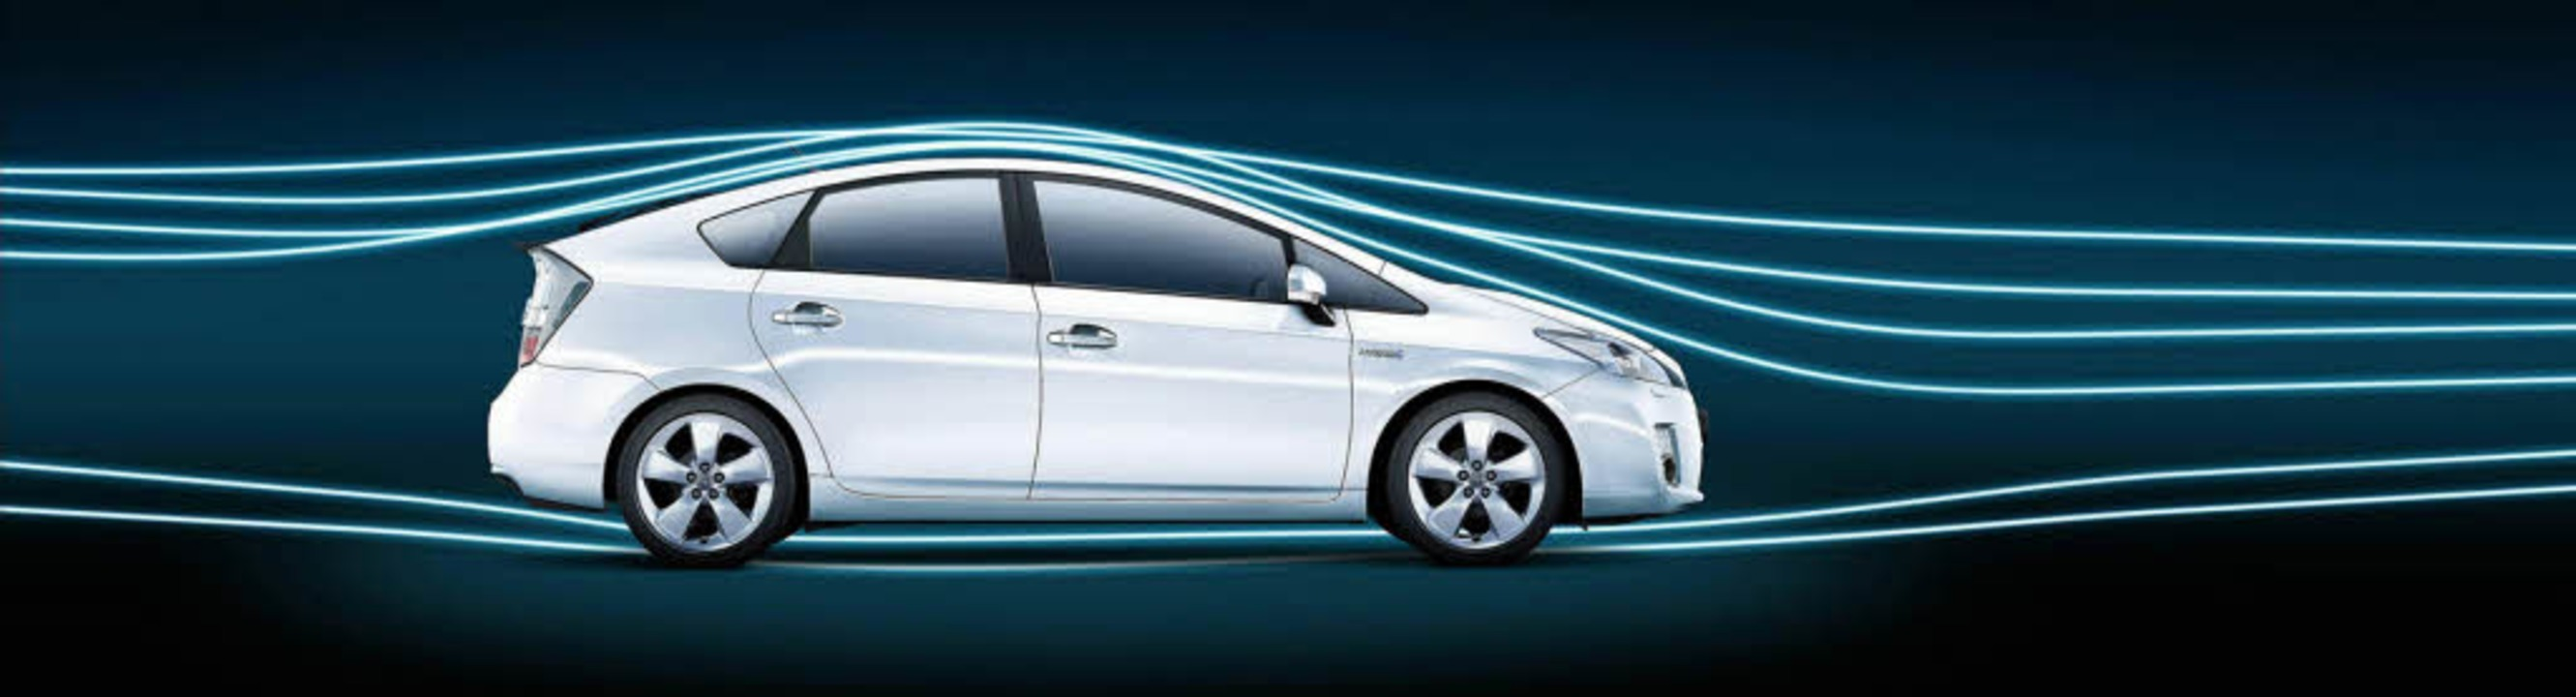 Schnittig: Toyota Prius im Windkanal  | Foto: Daimler AG/Toyota